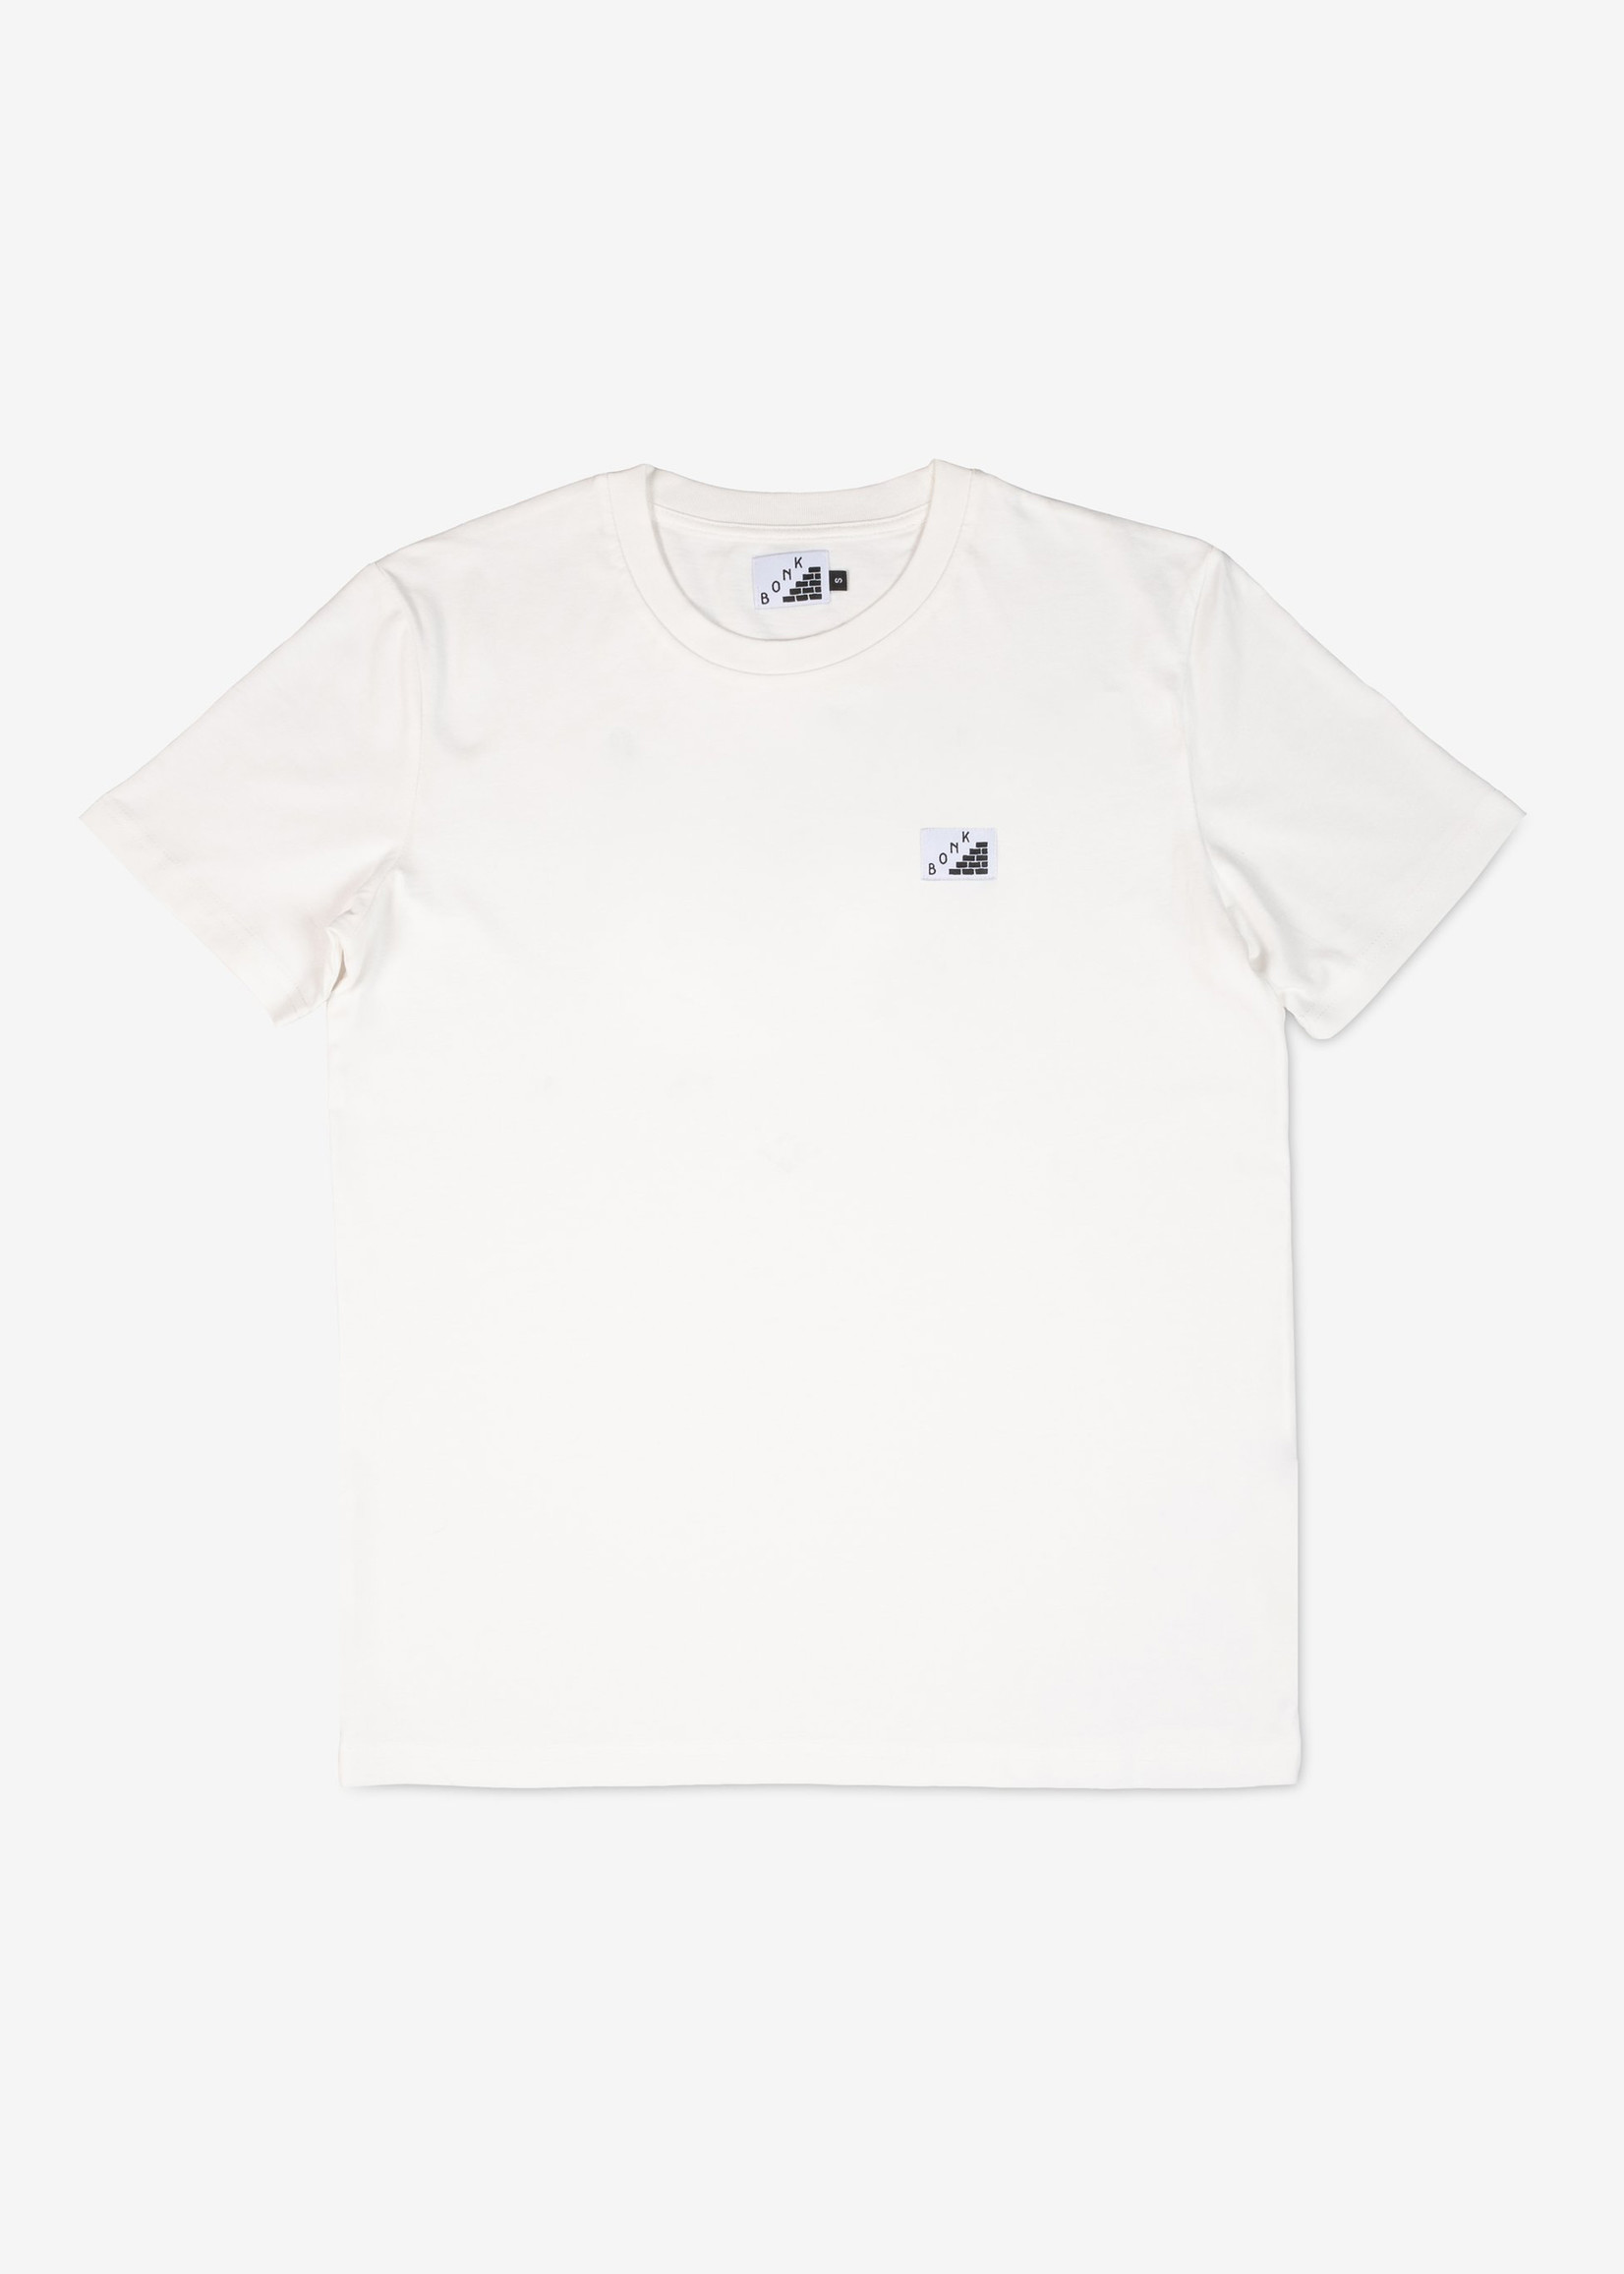 Bonk T-Shirt - Log Out - Off White